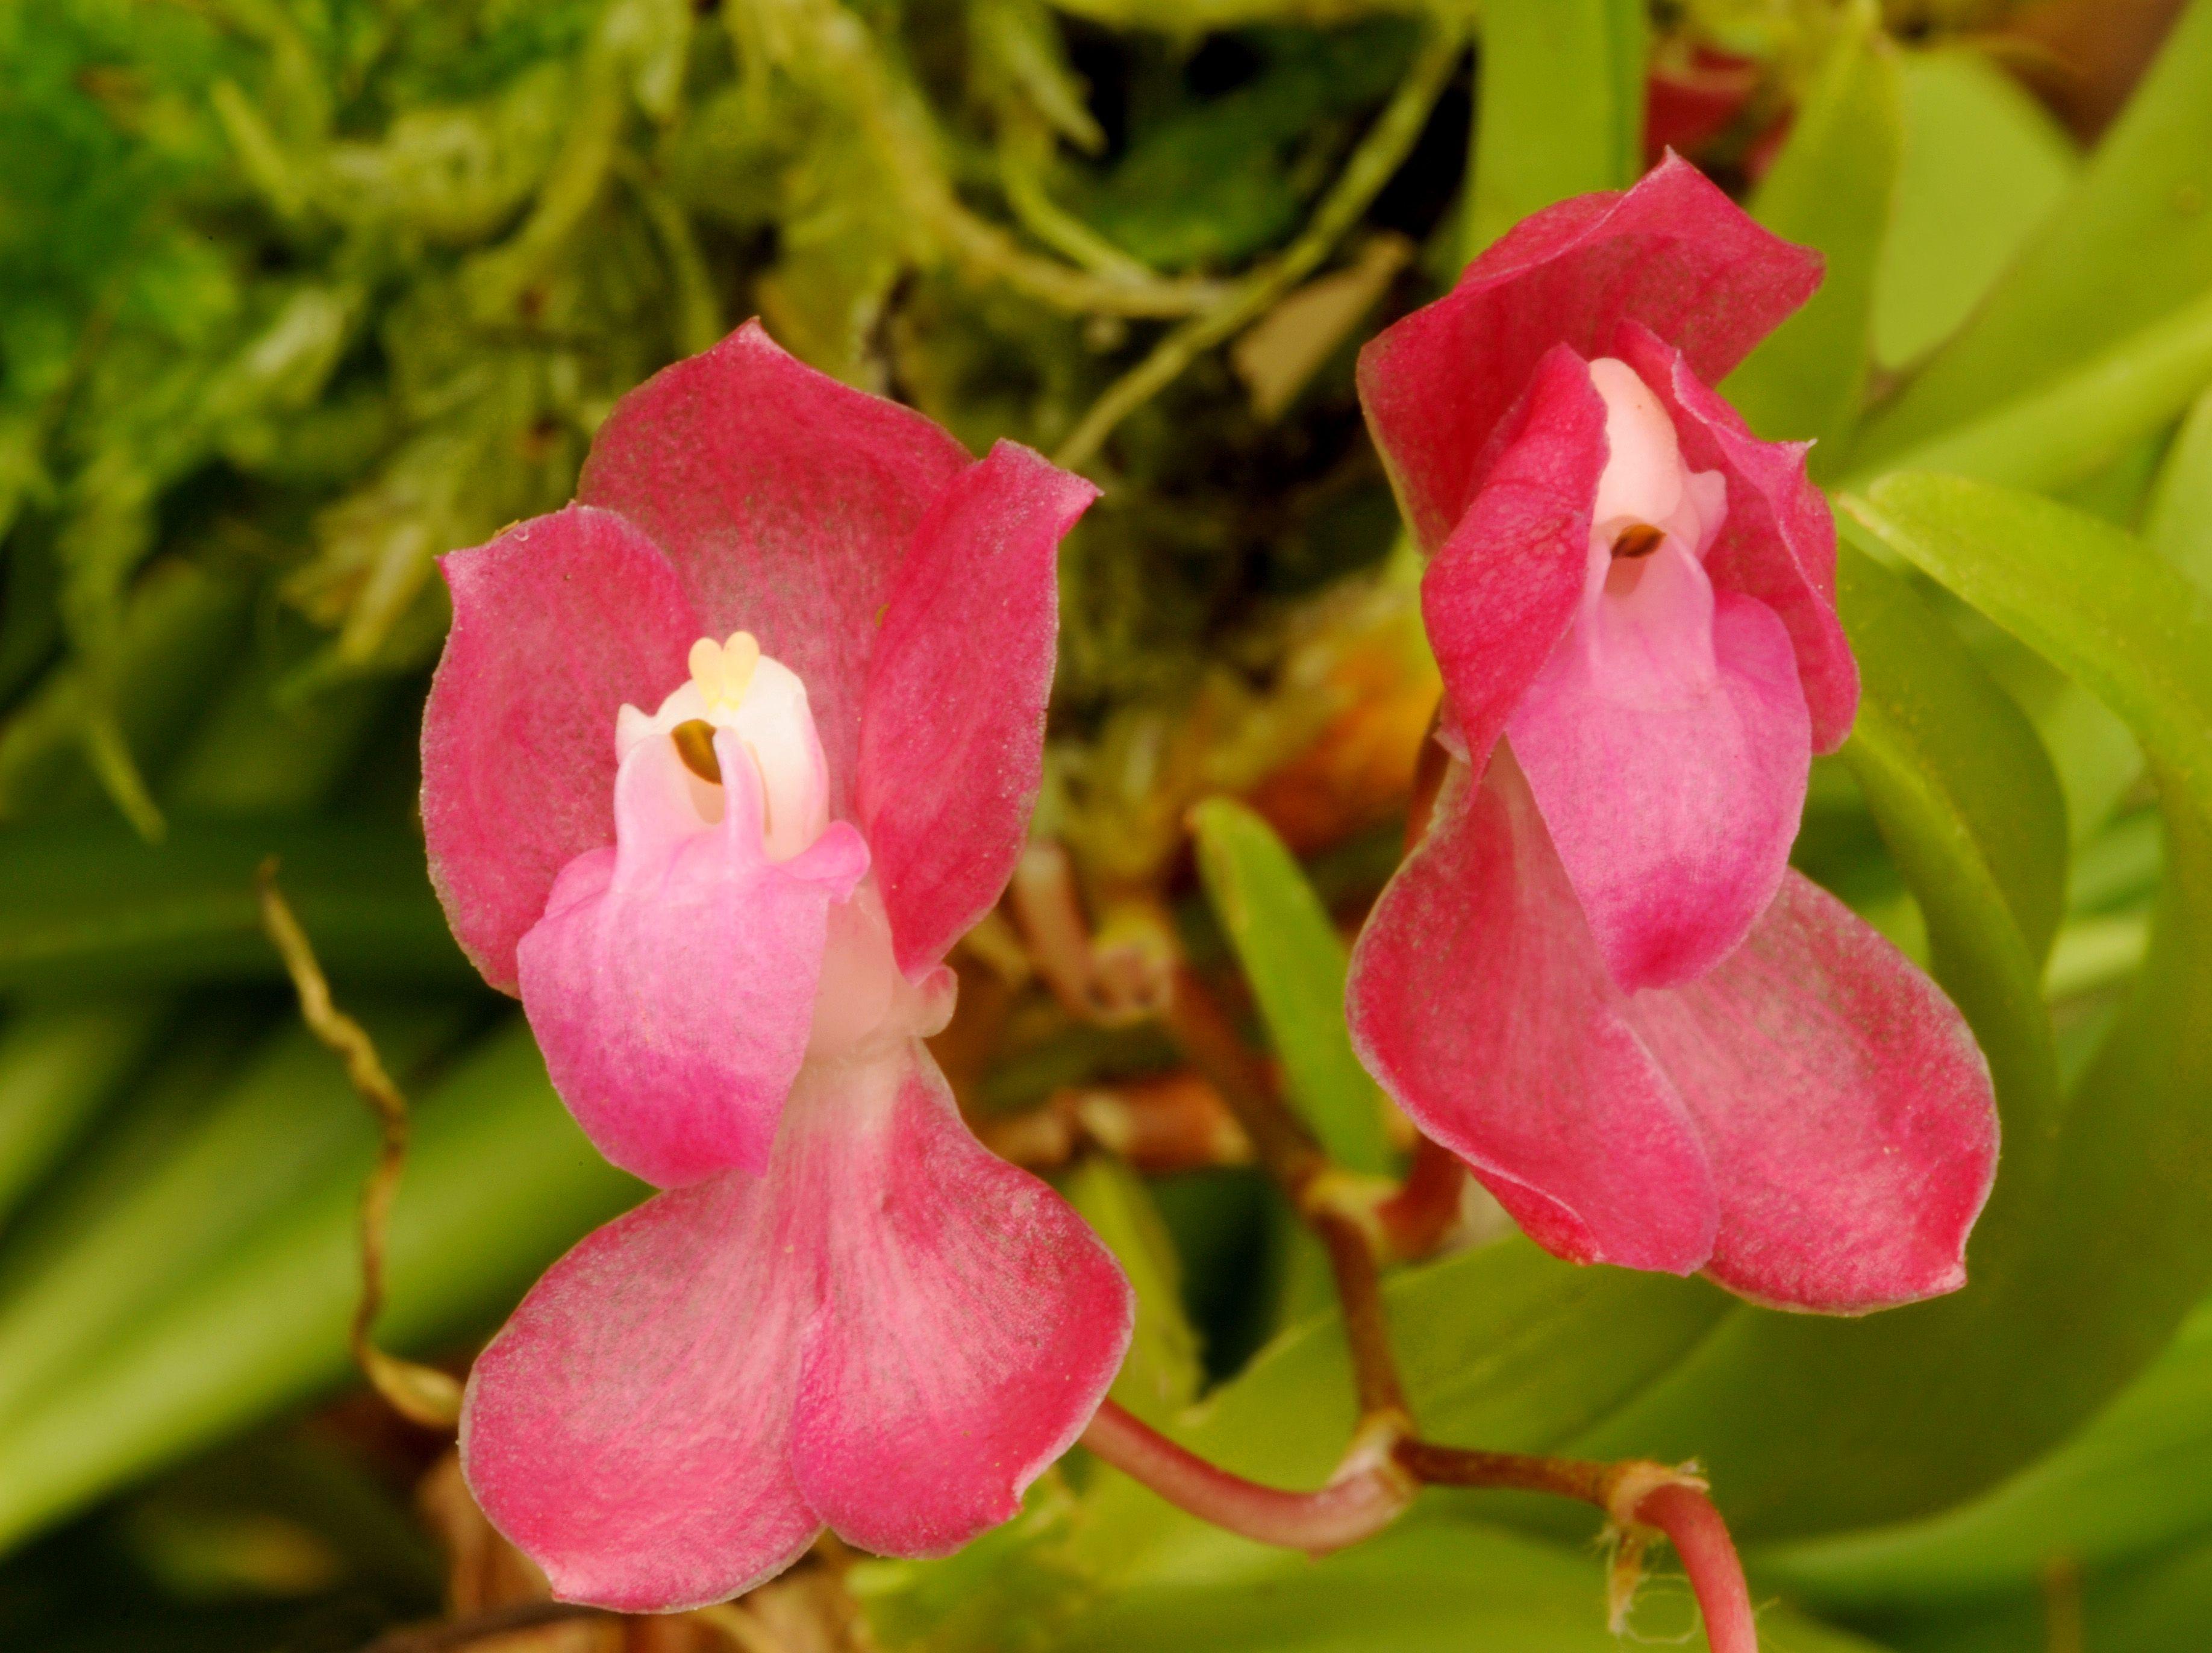 Cochlioda sanquinea | Orchid Flowers: Their Colors, Beauty ...